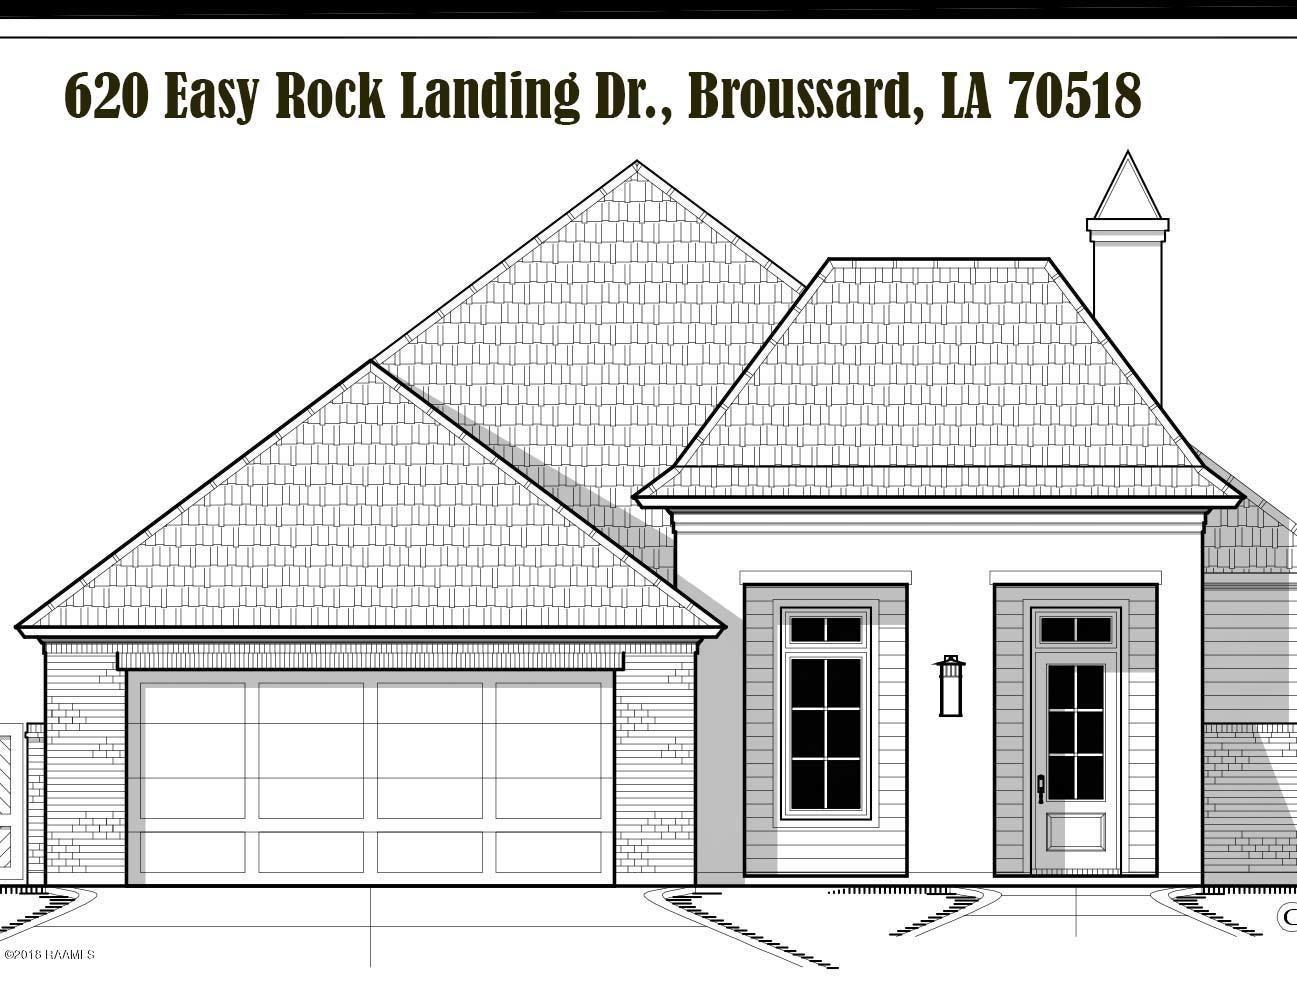 620 Easy Rock Landing Drive, Broussard, LA 70518